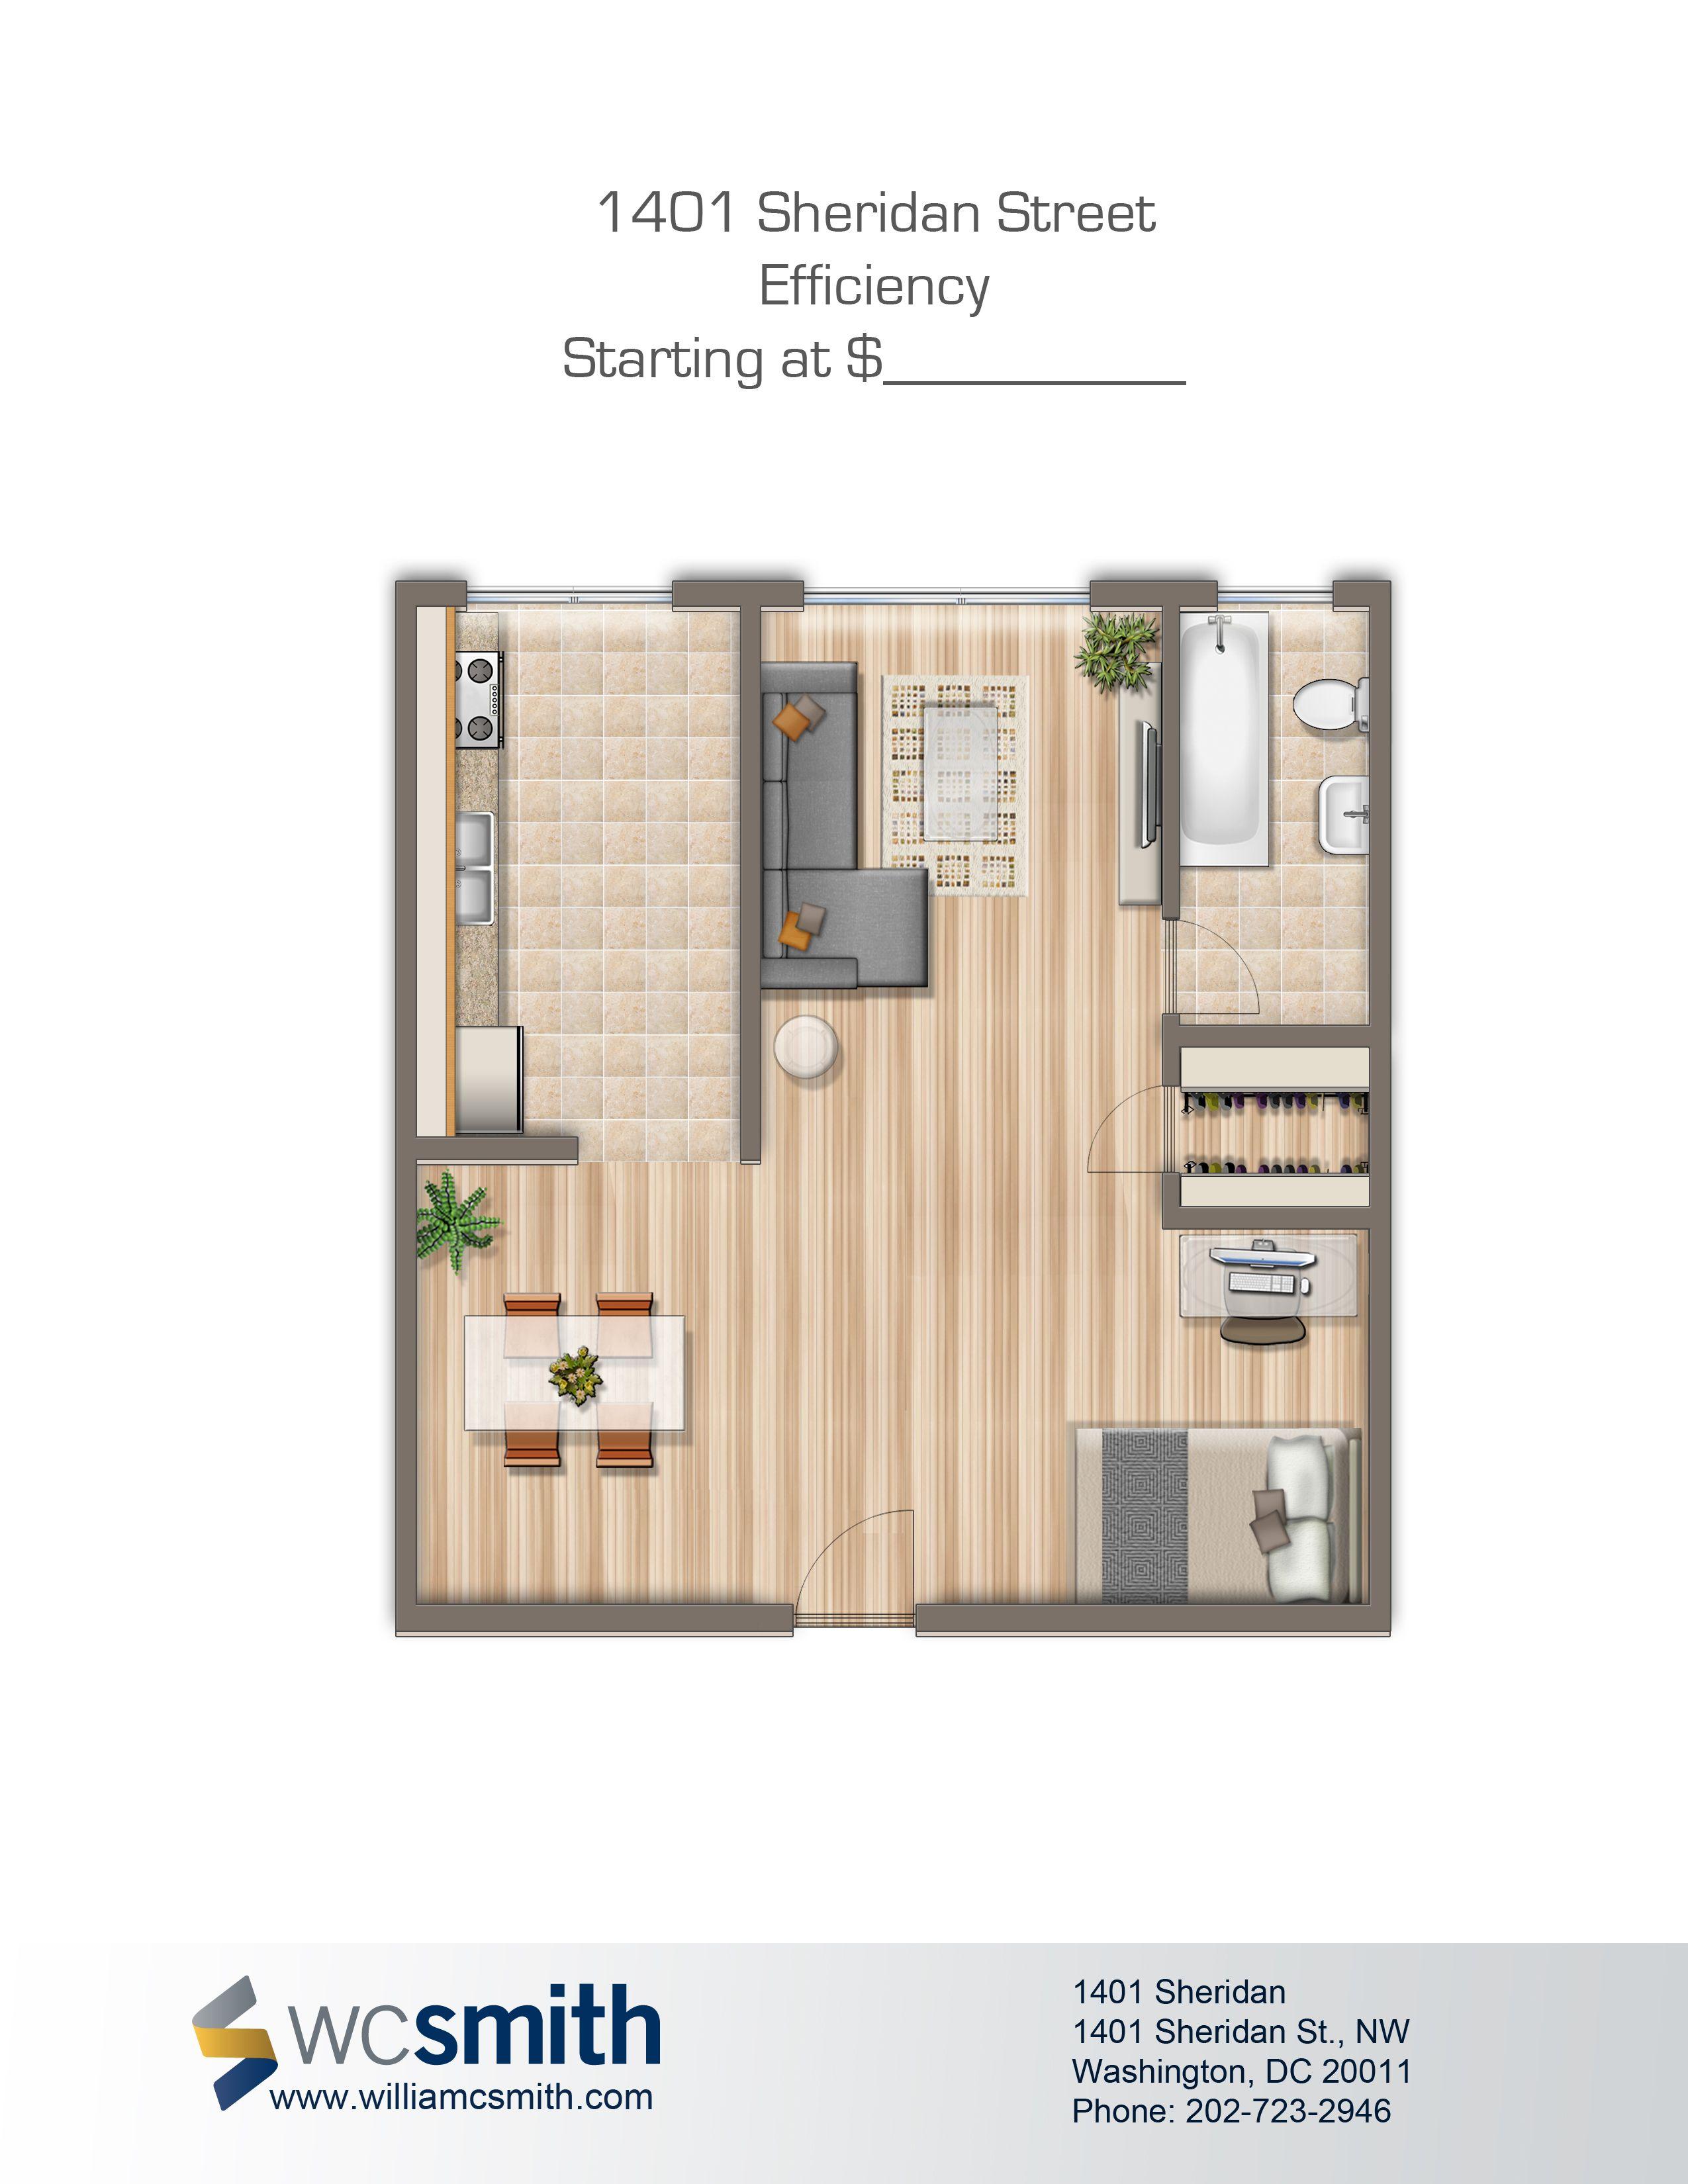 1401 Sheridan St N W One Bedroom Apartment Locker Storage